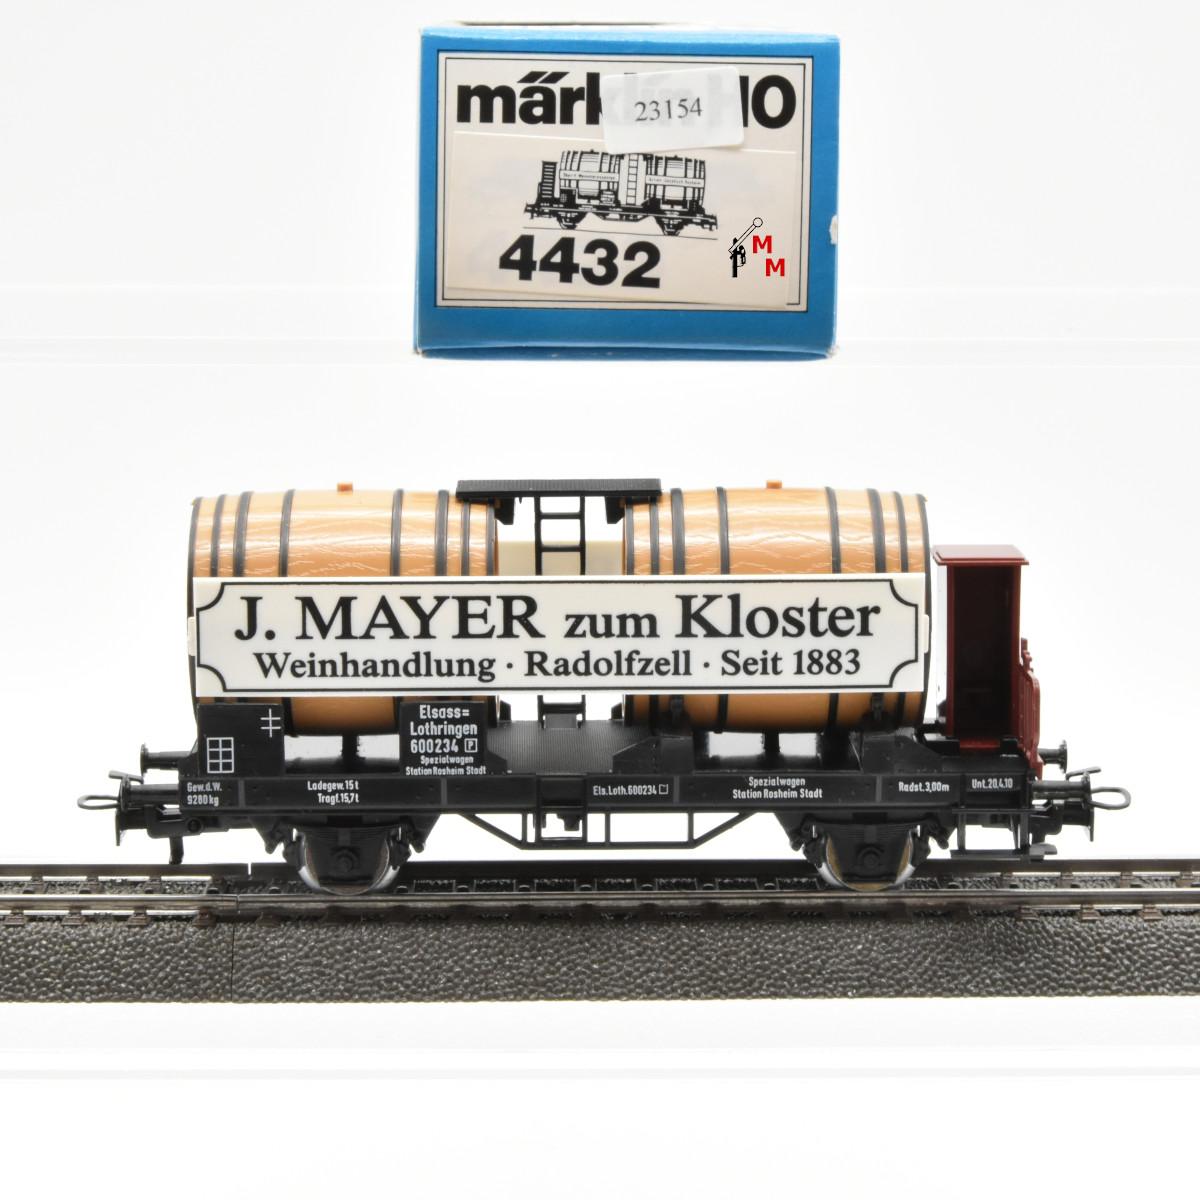 "Märklin 4432/1883 Weinwagen ""J. Mayer zum Kloster""...,(23154)"